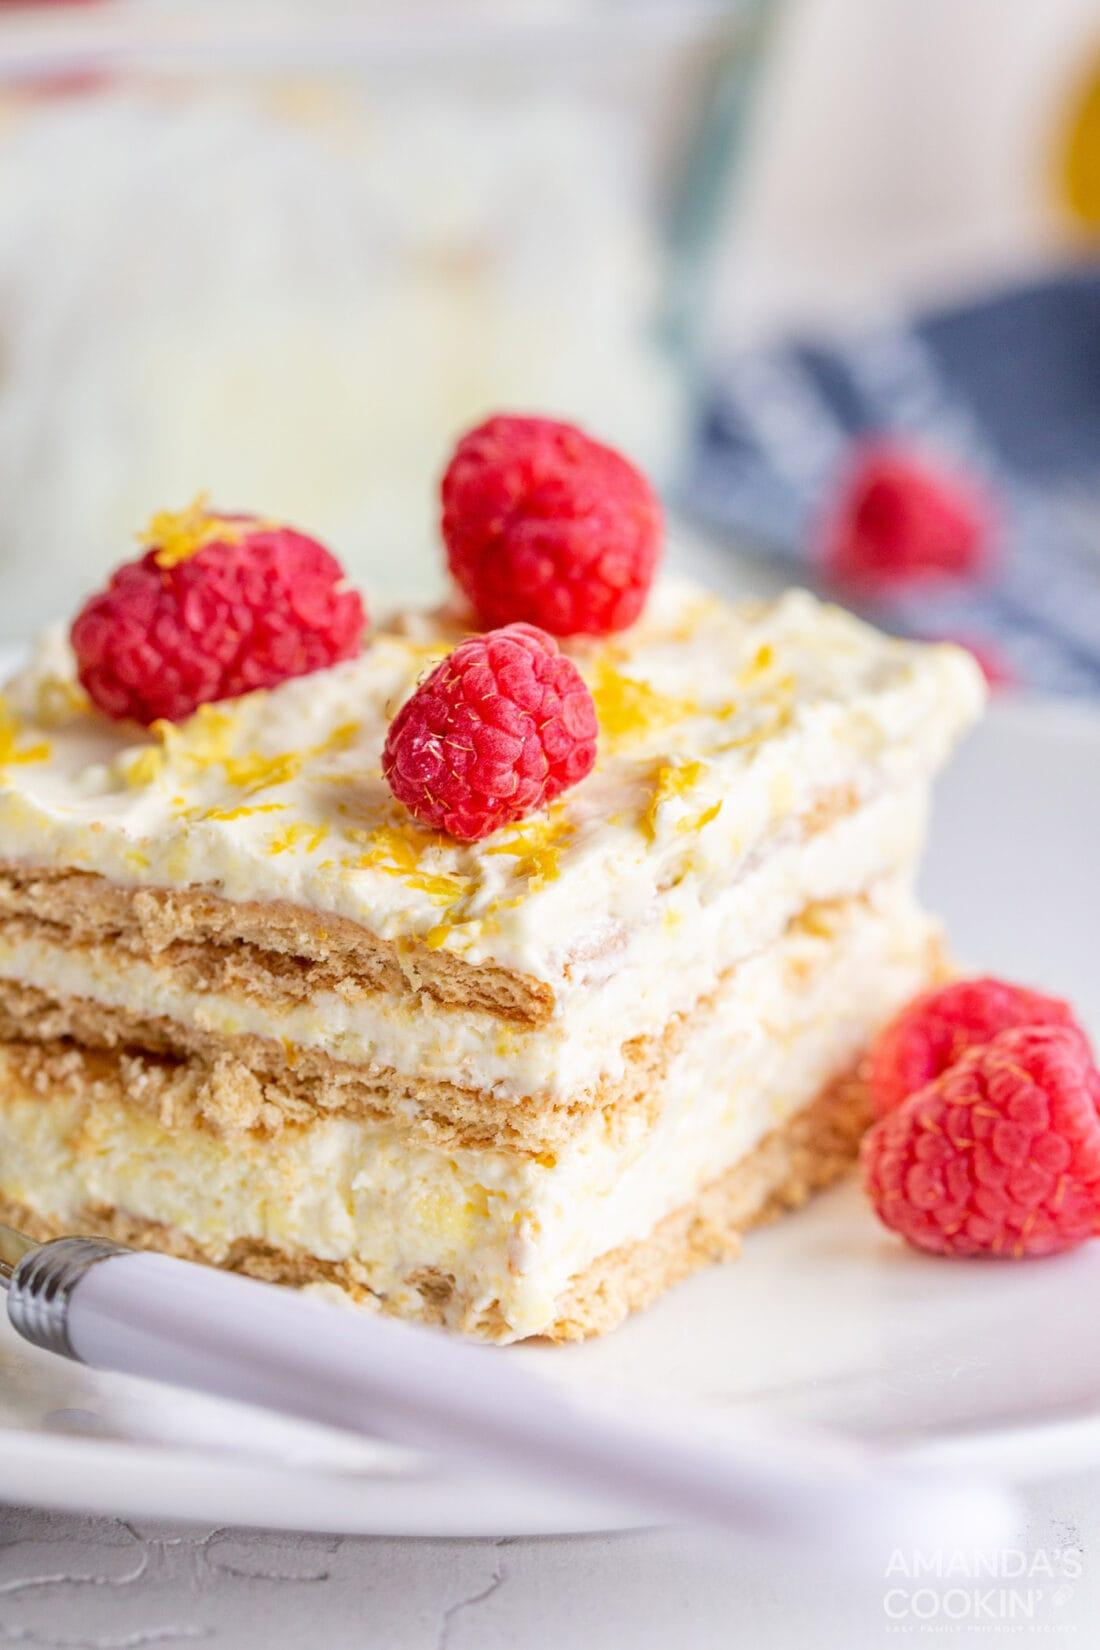 slice of lemon icebox cake